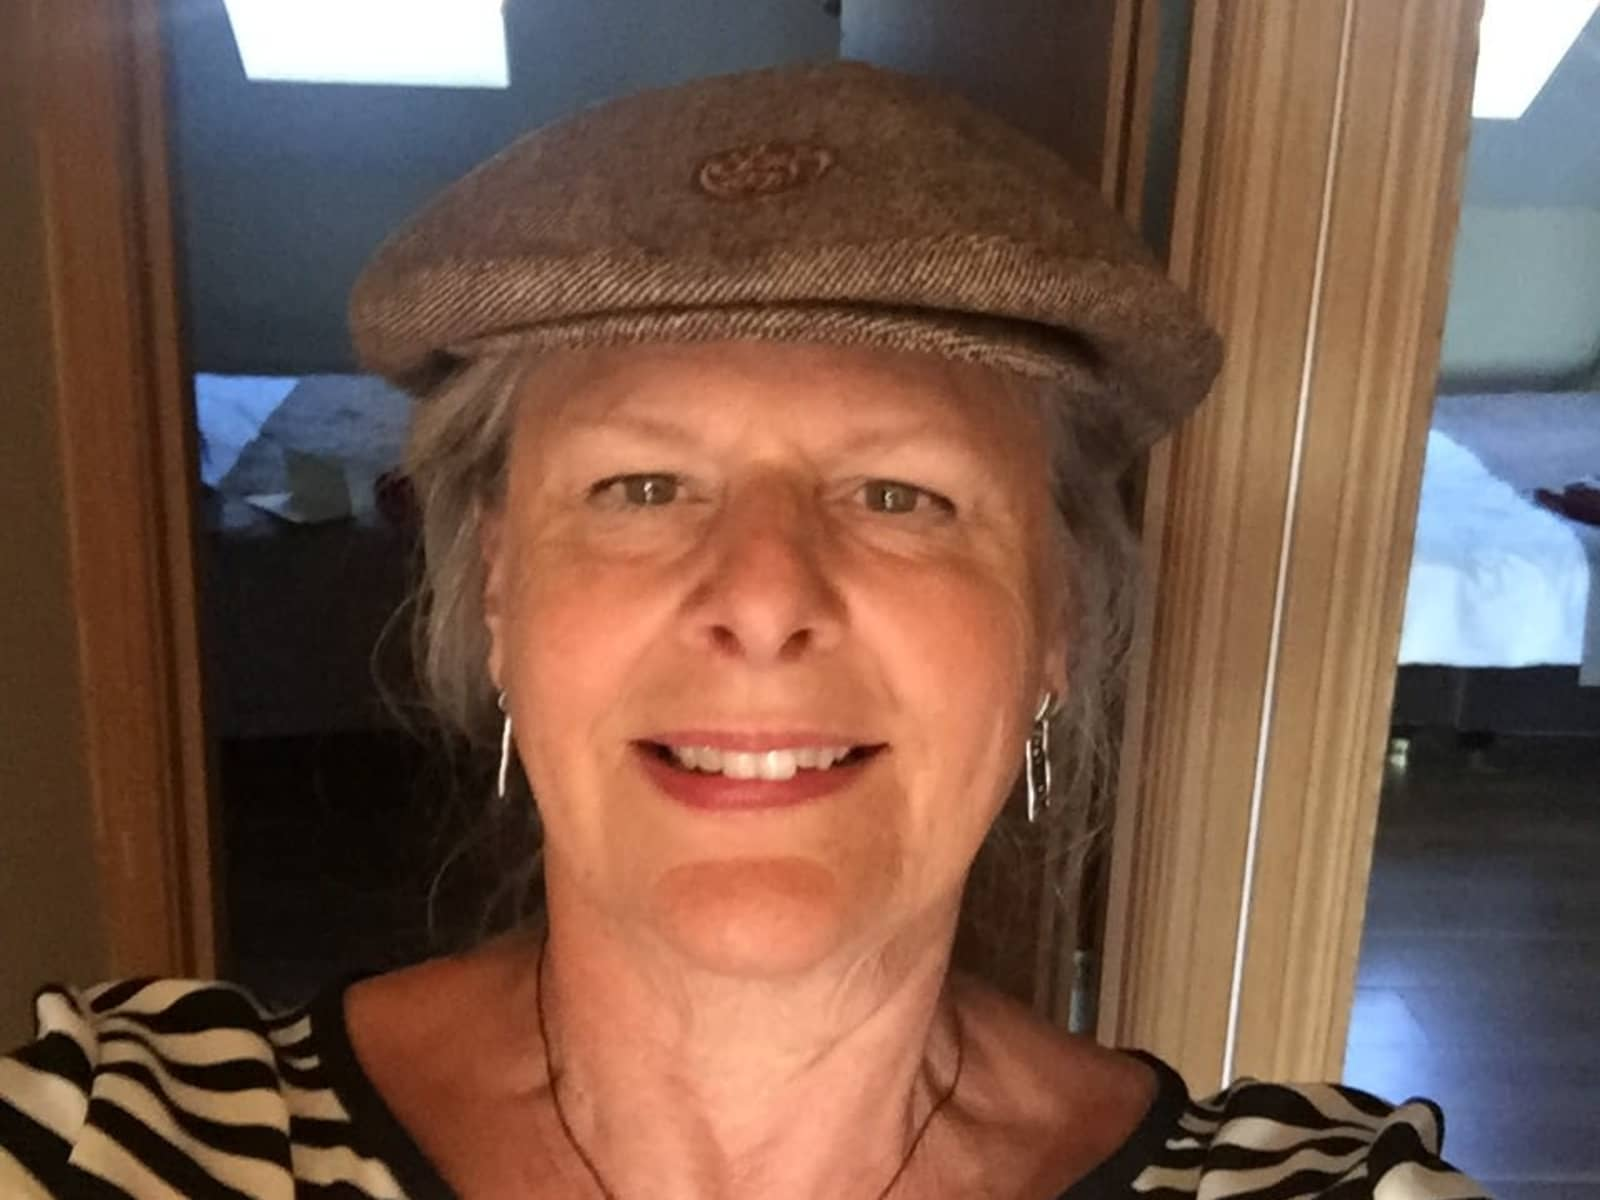 Jean from Saint Paul, Minnesota, United States